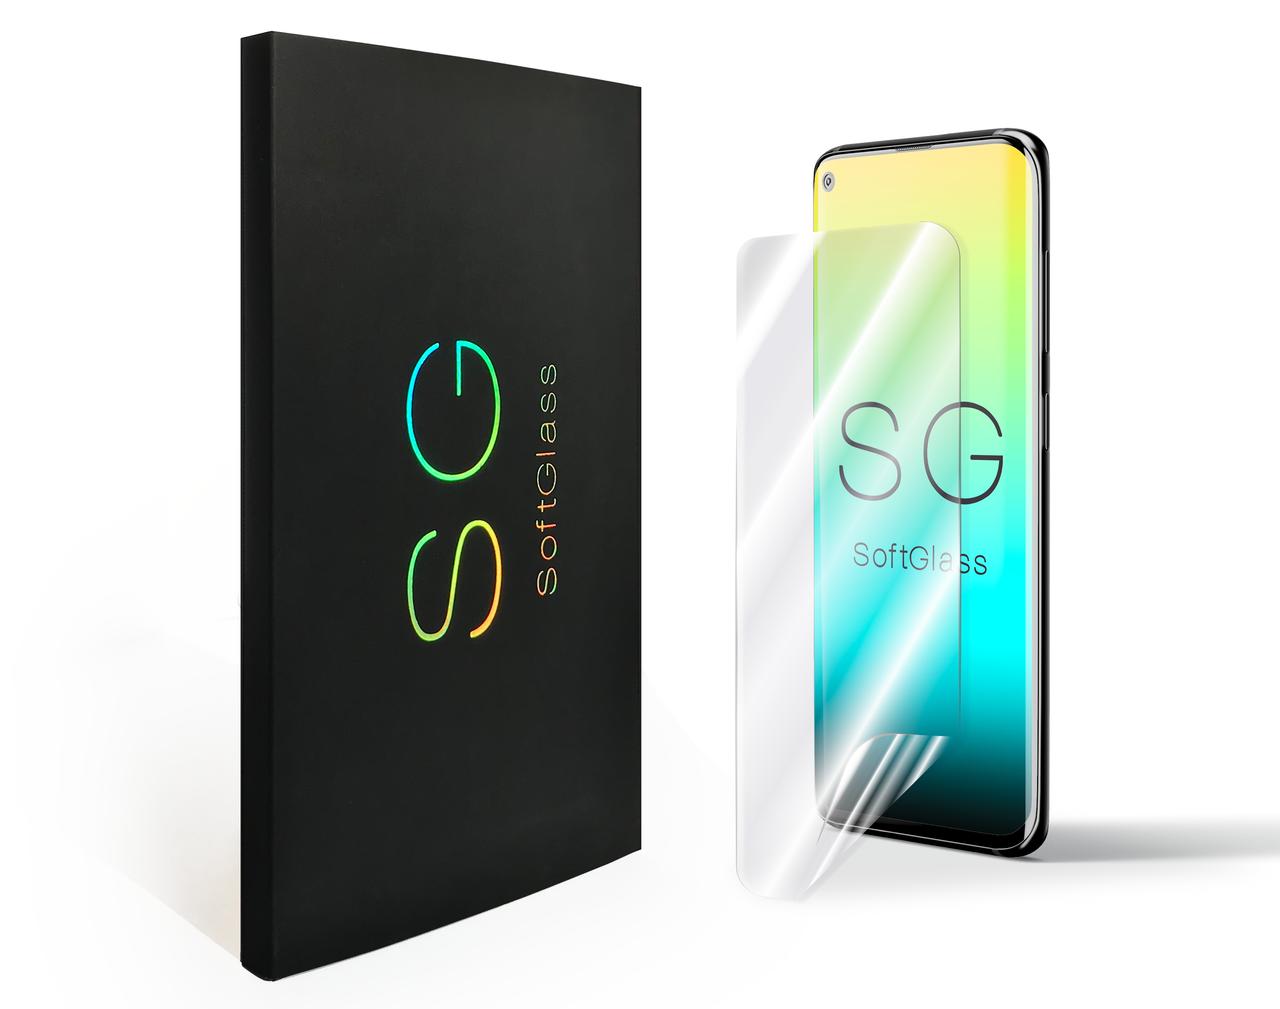 М'яке скло для Samsung A01 2020 A015F SoftGlass Екран